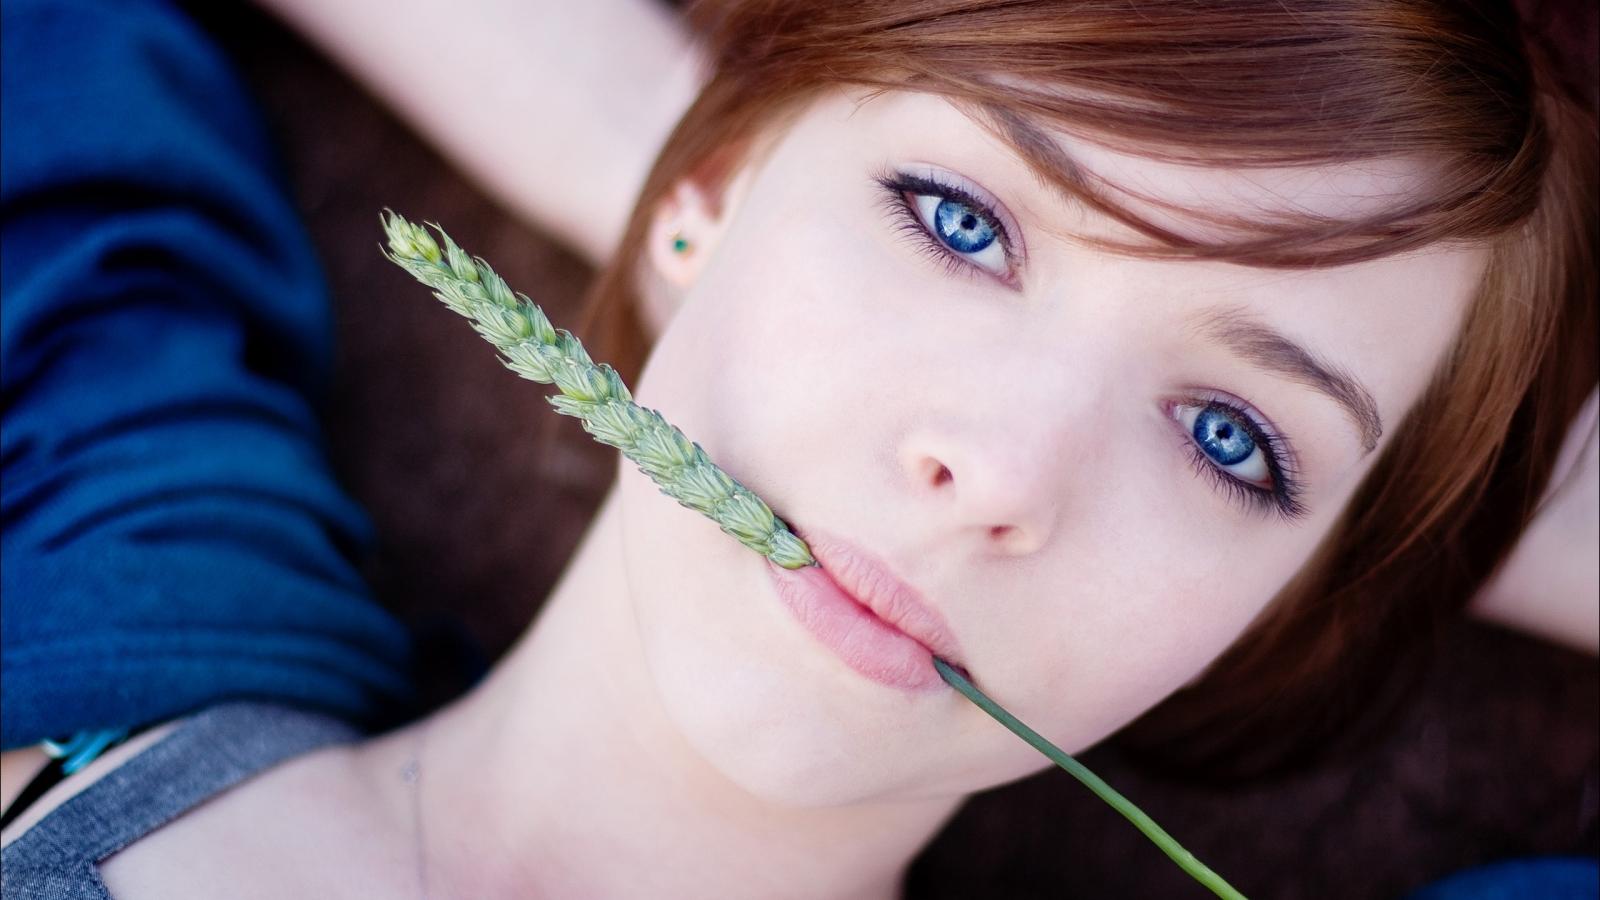 Pelirroja de ojos azules - 1600x900